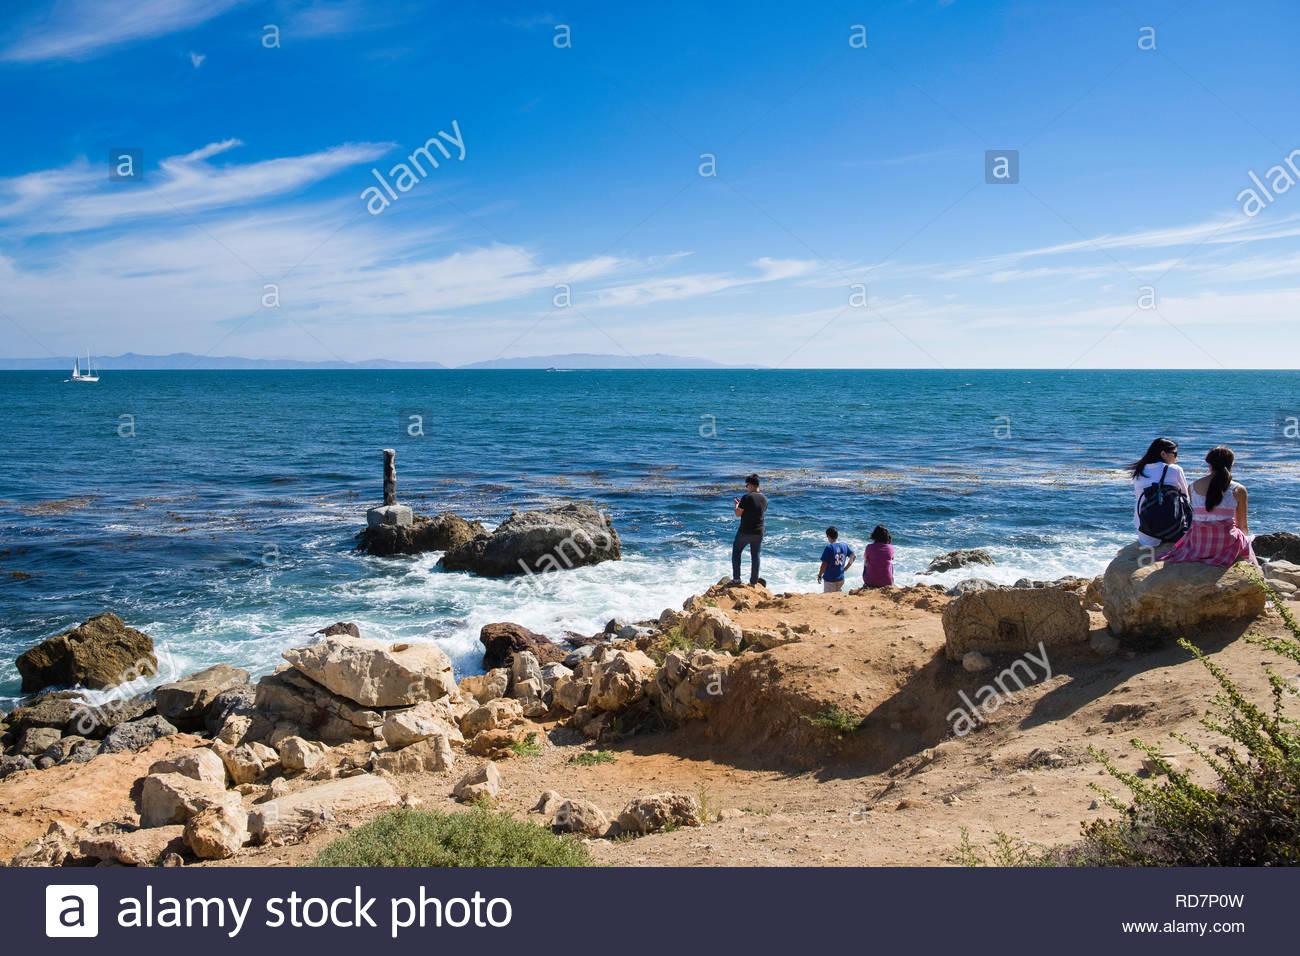 Santa Catalina Island seen from Long Point along Terranea trail, Palos Verdes Peninsula, Los Angeles County, California, USA - Stock Image